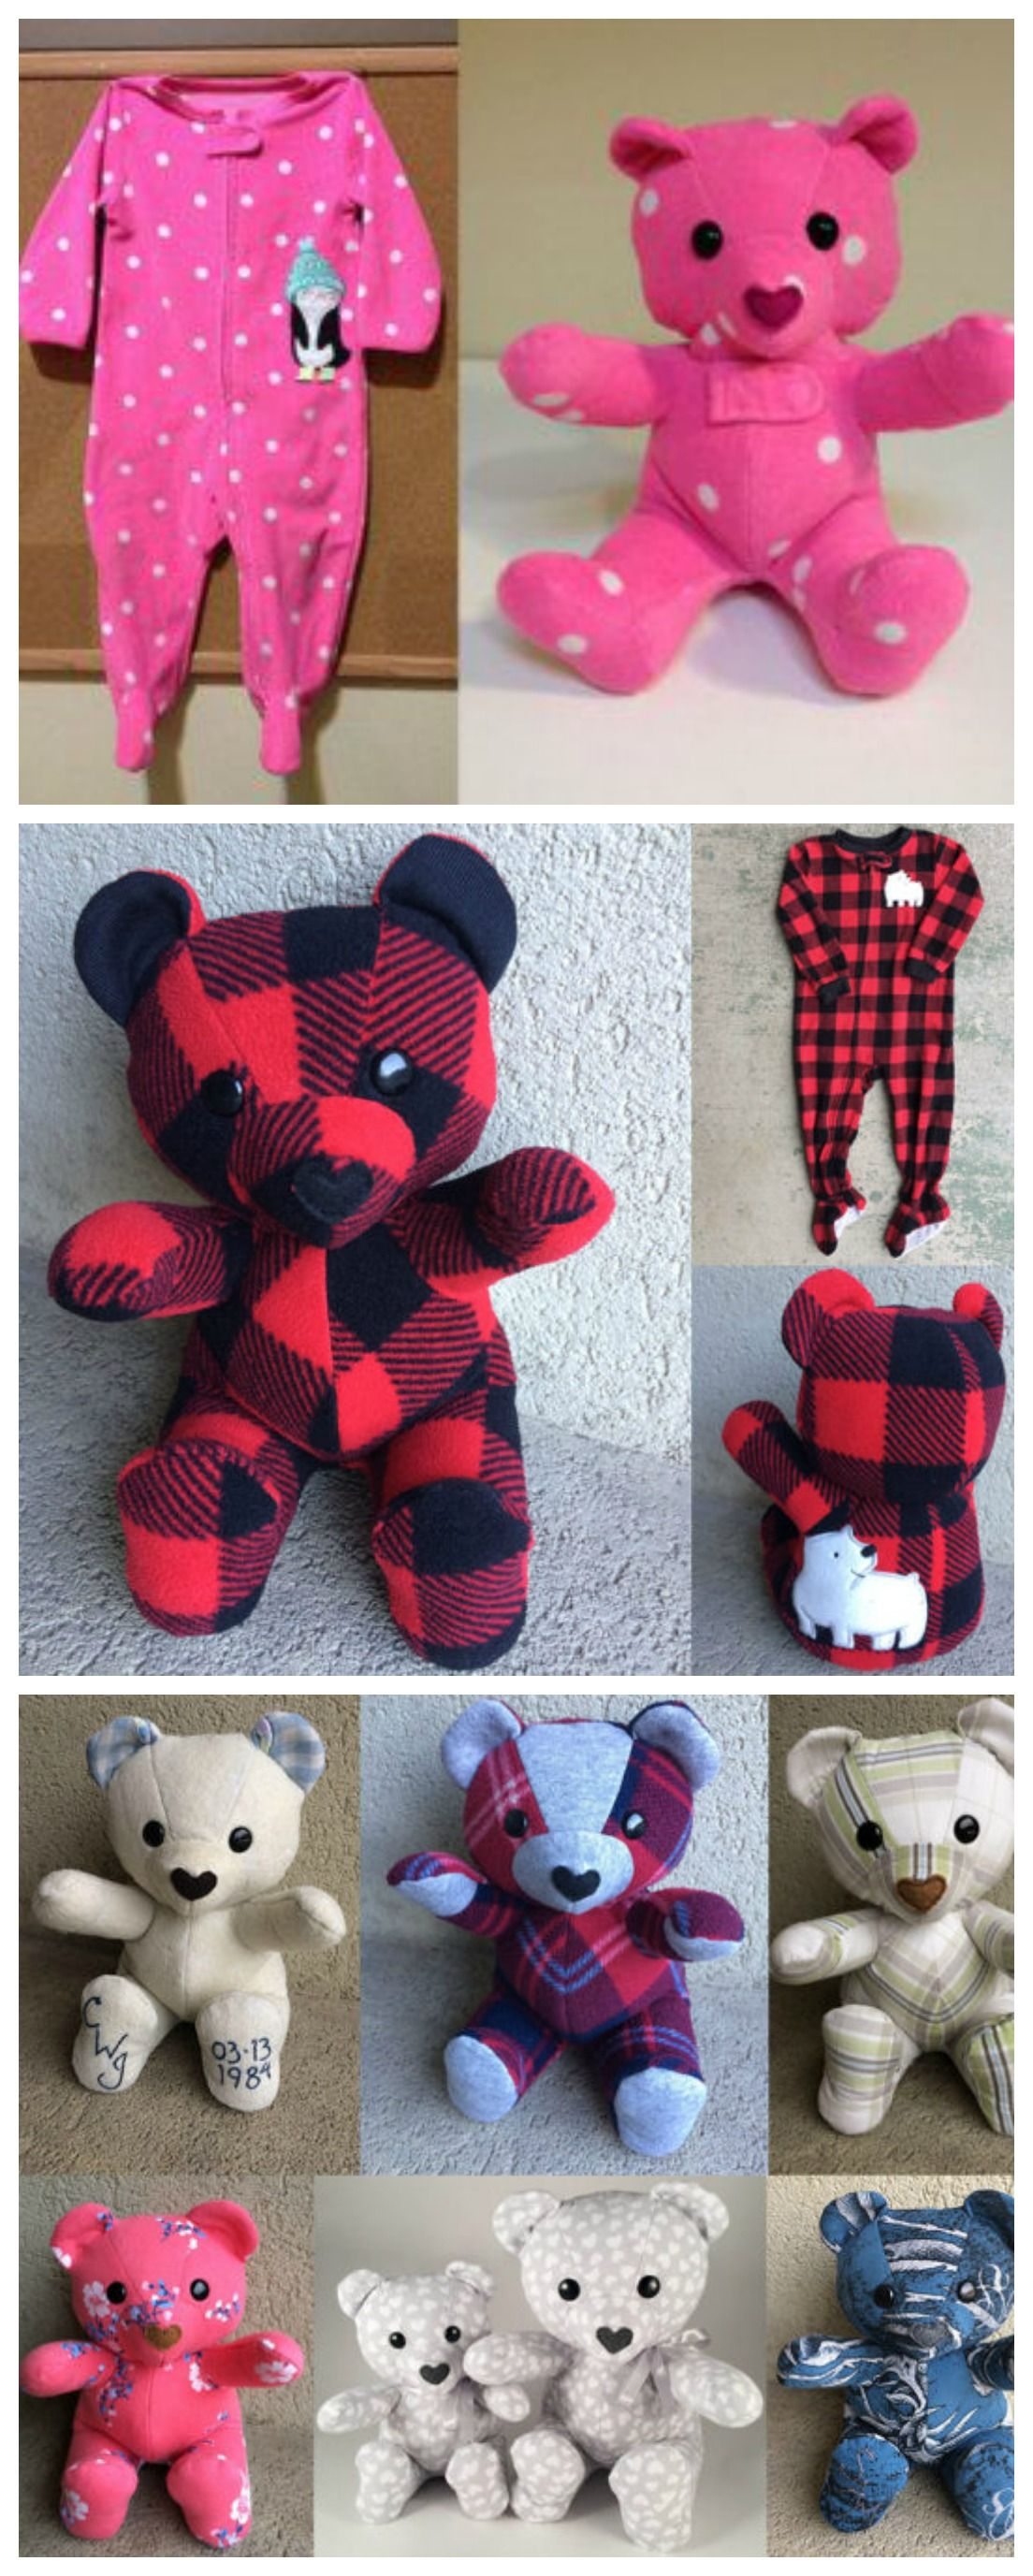 DIY Keepsake Memory Teddy Bear from Baby Clothes   Pinterest   Nähen ...